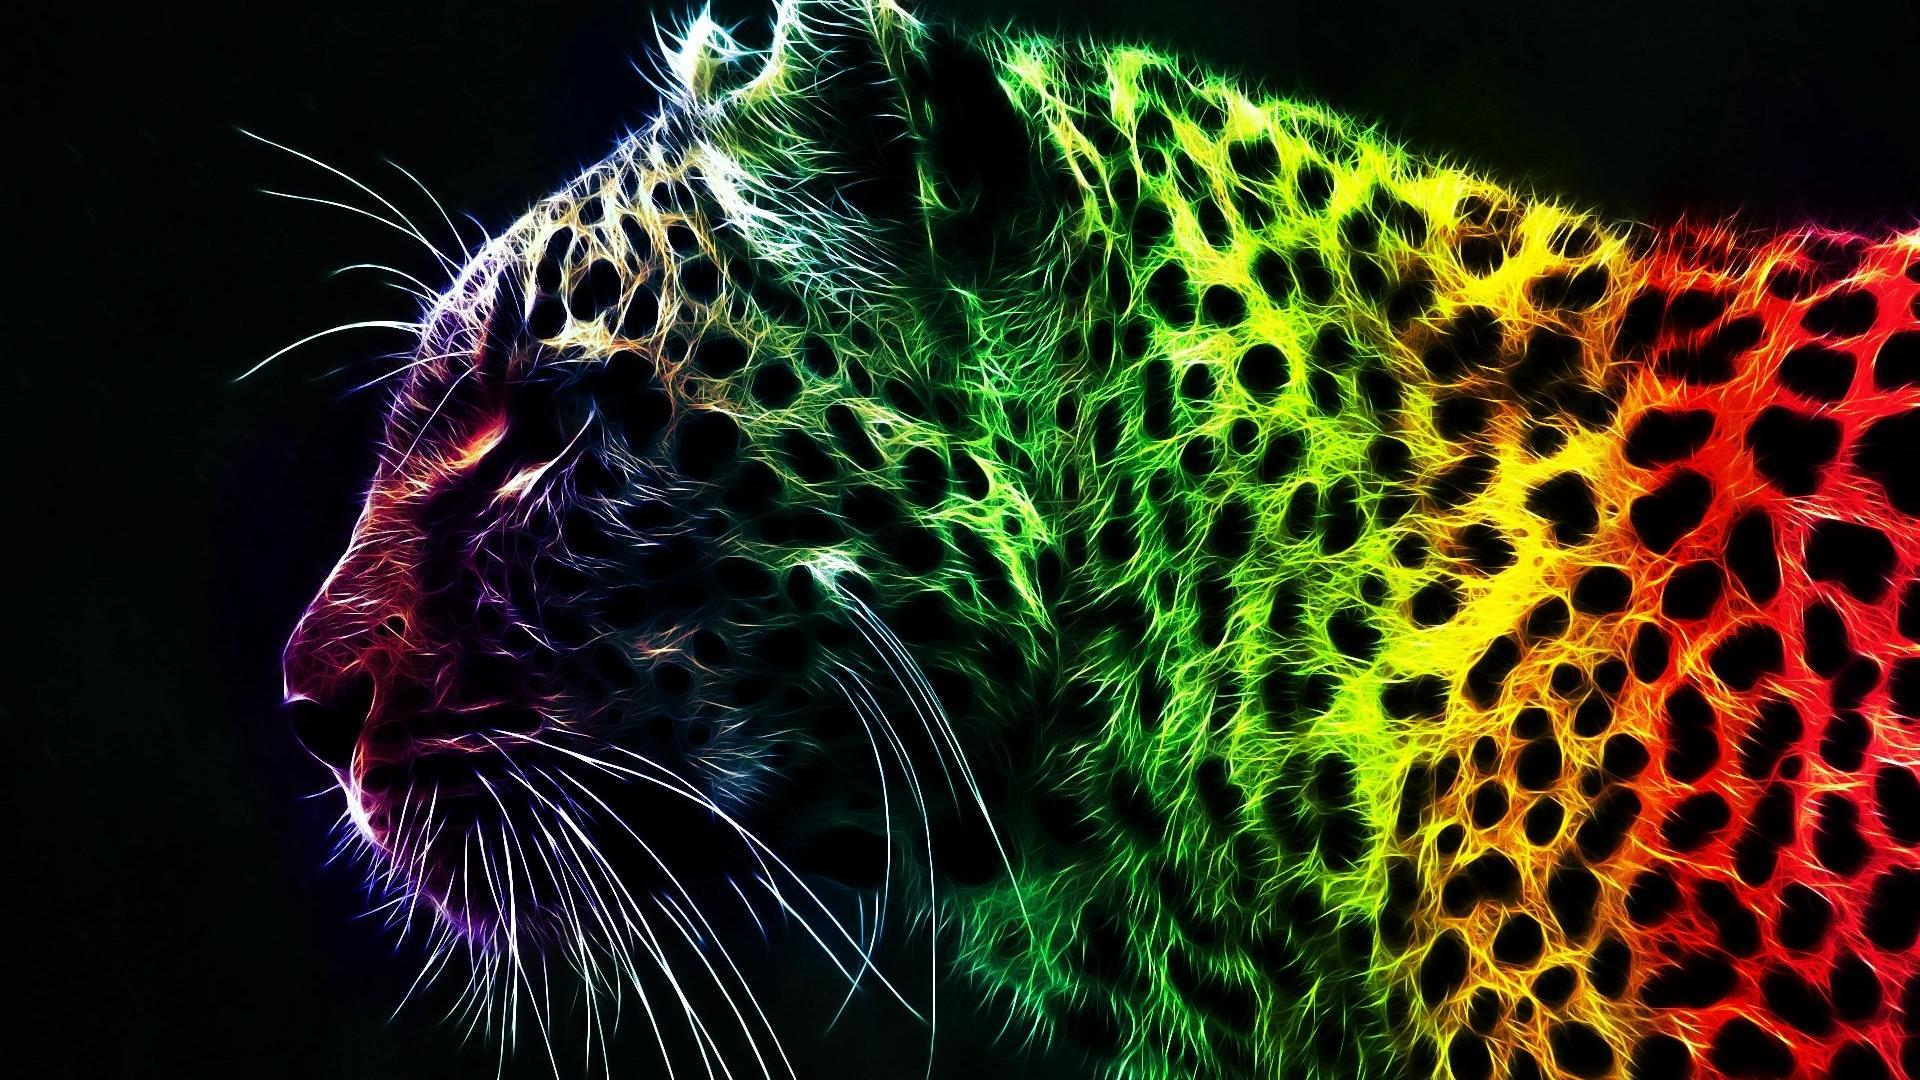 download animal abstract art hd wallpaper full hd wallpapers